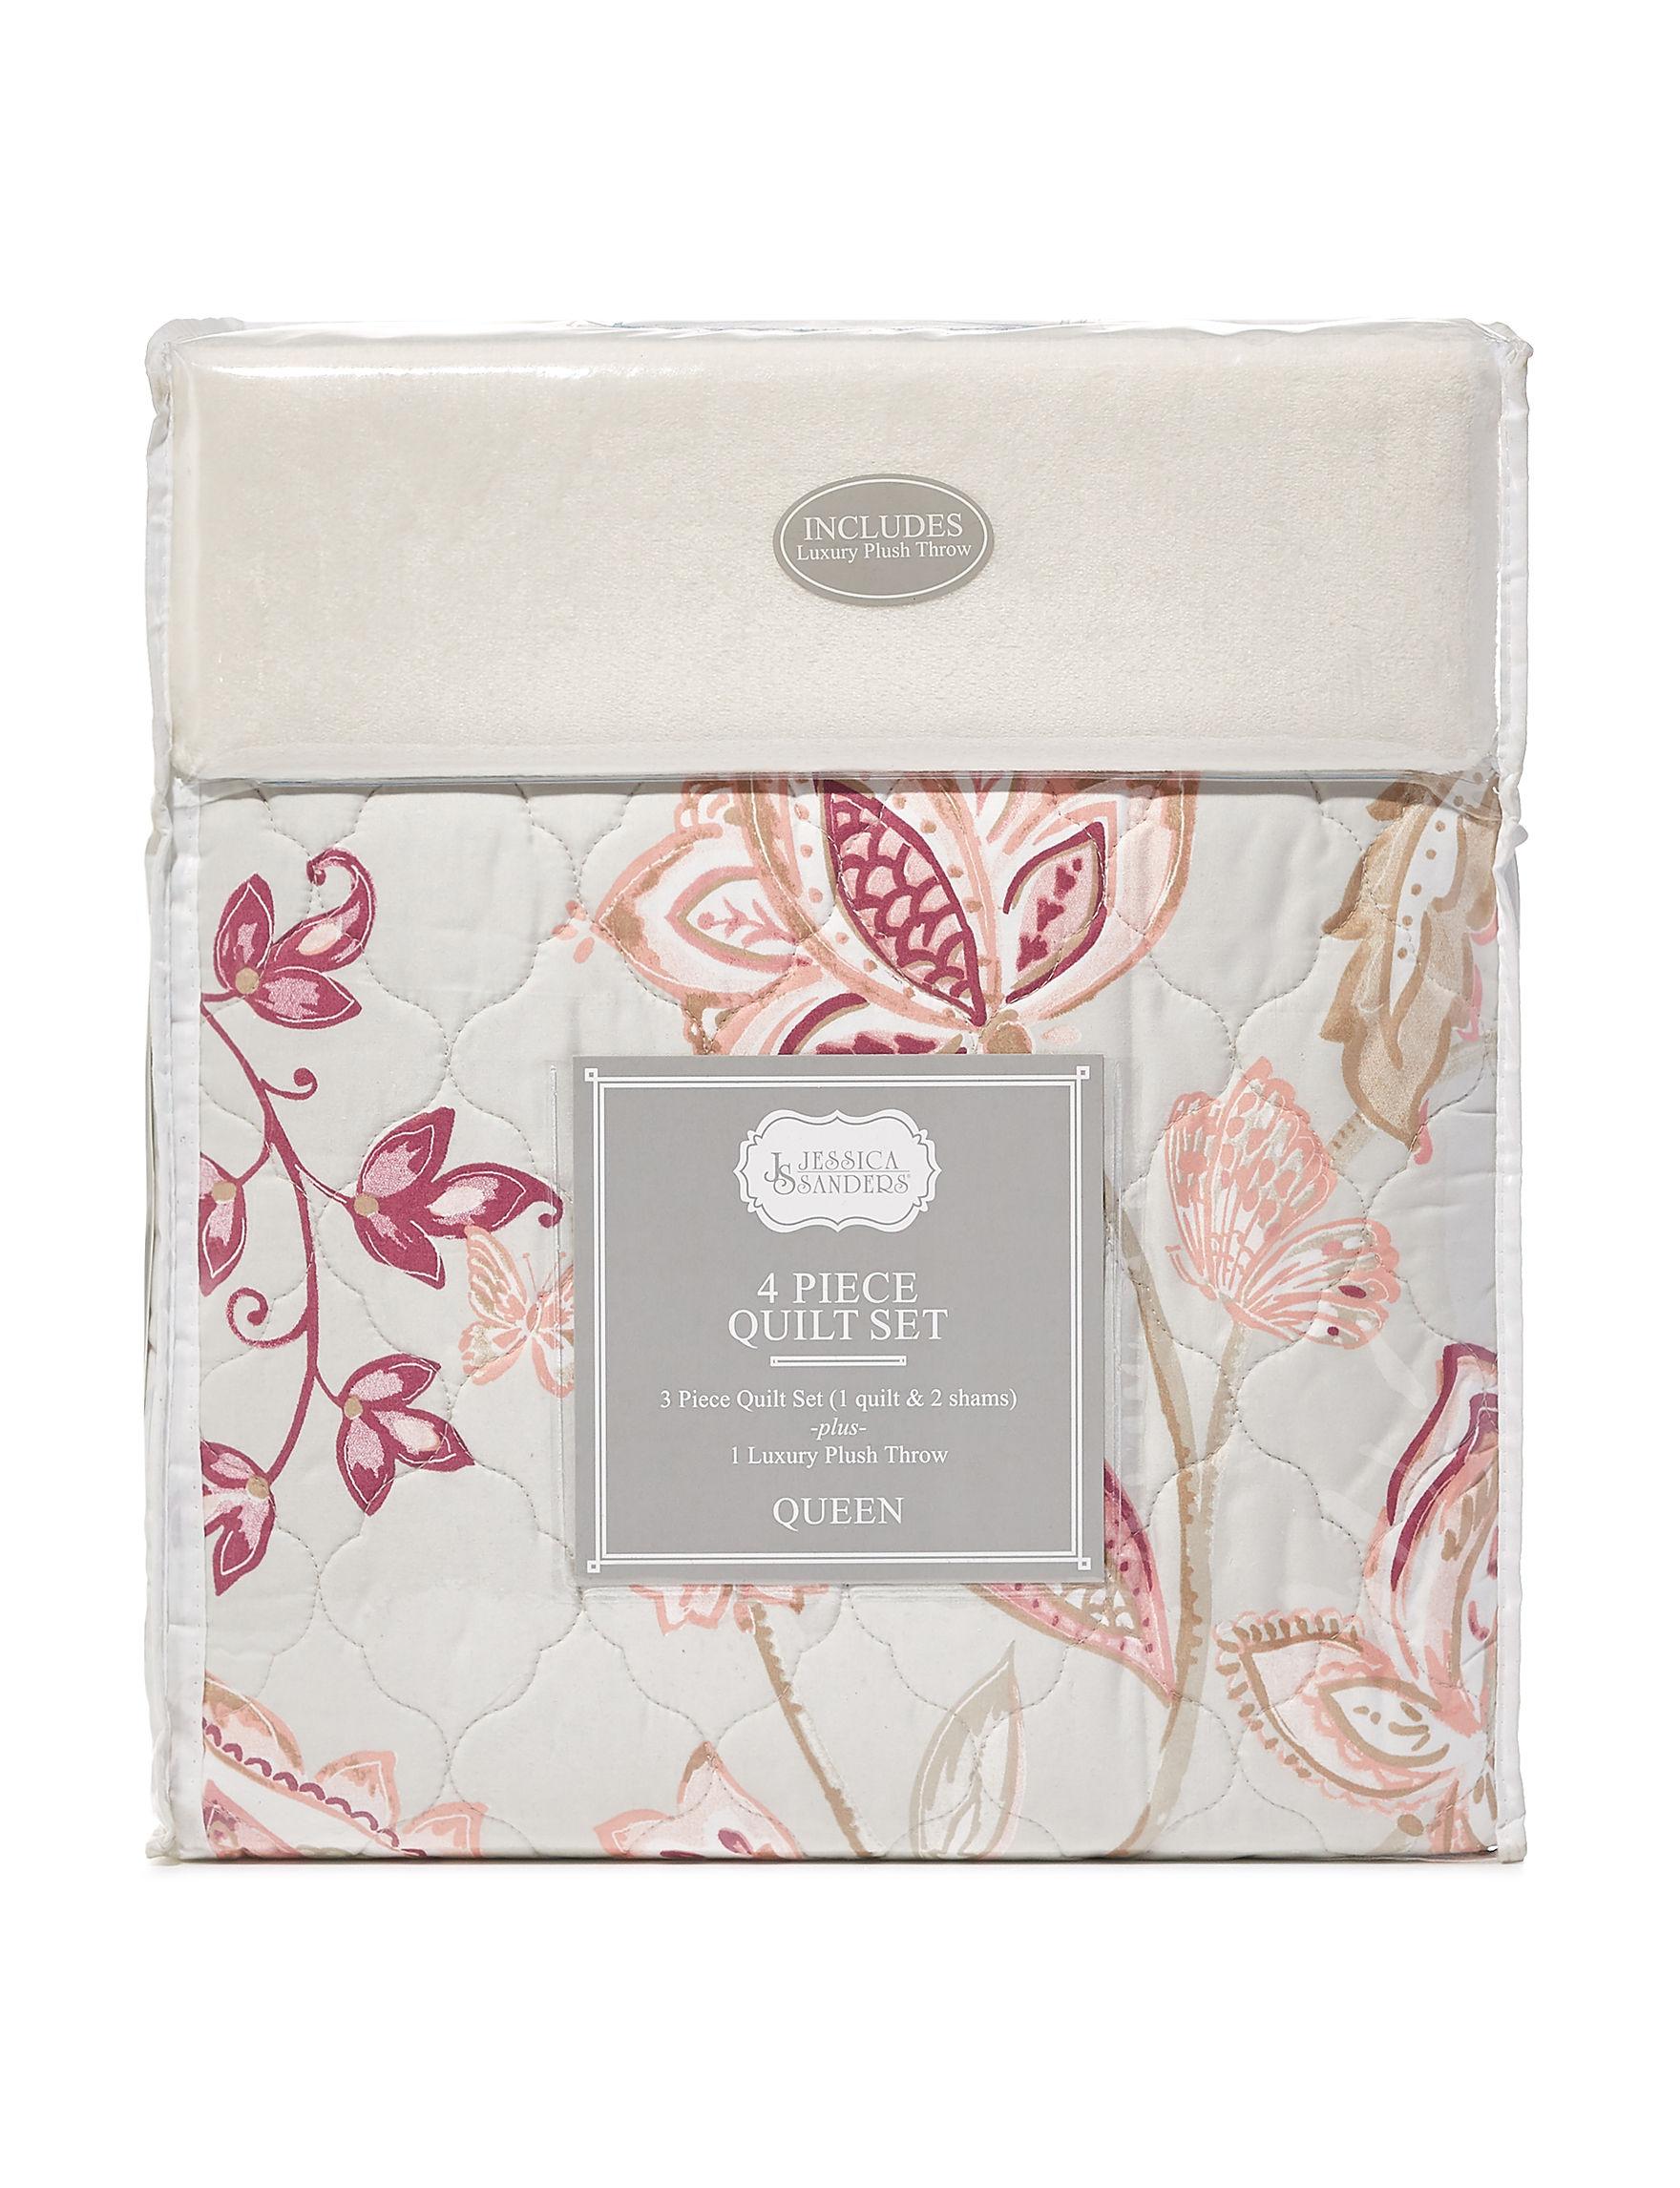 Jessica Sanders Pink Quilts & Quilt Sets